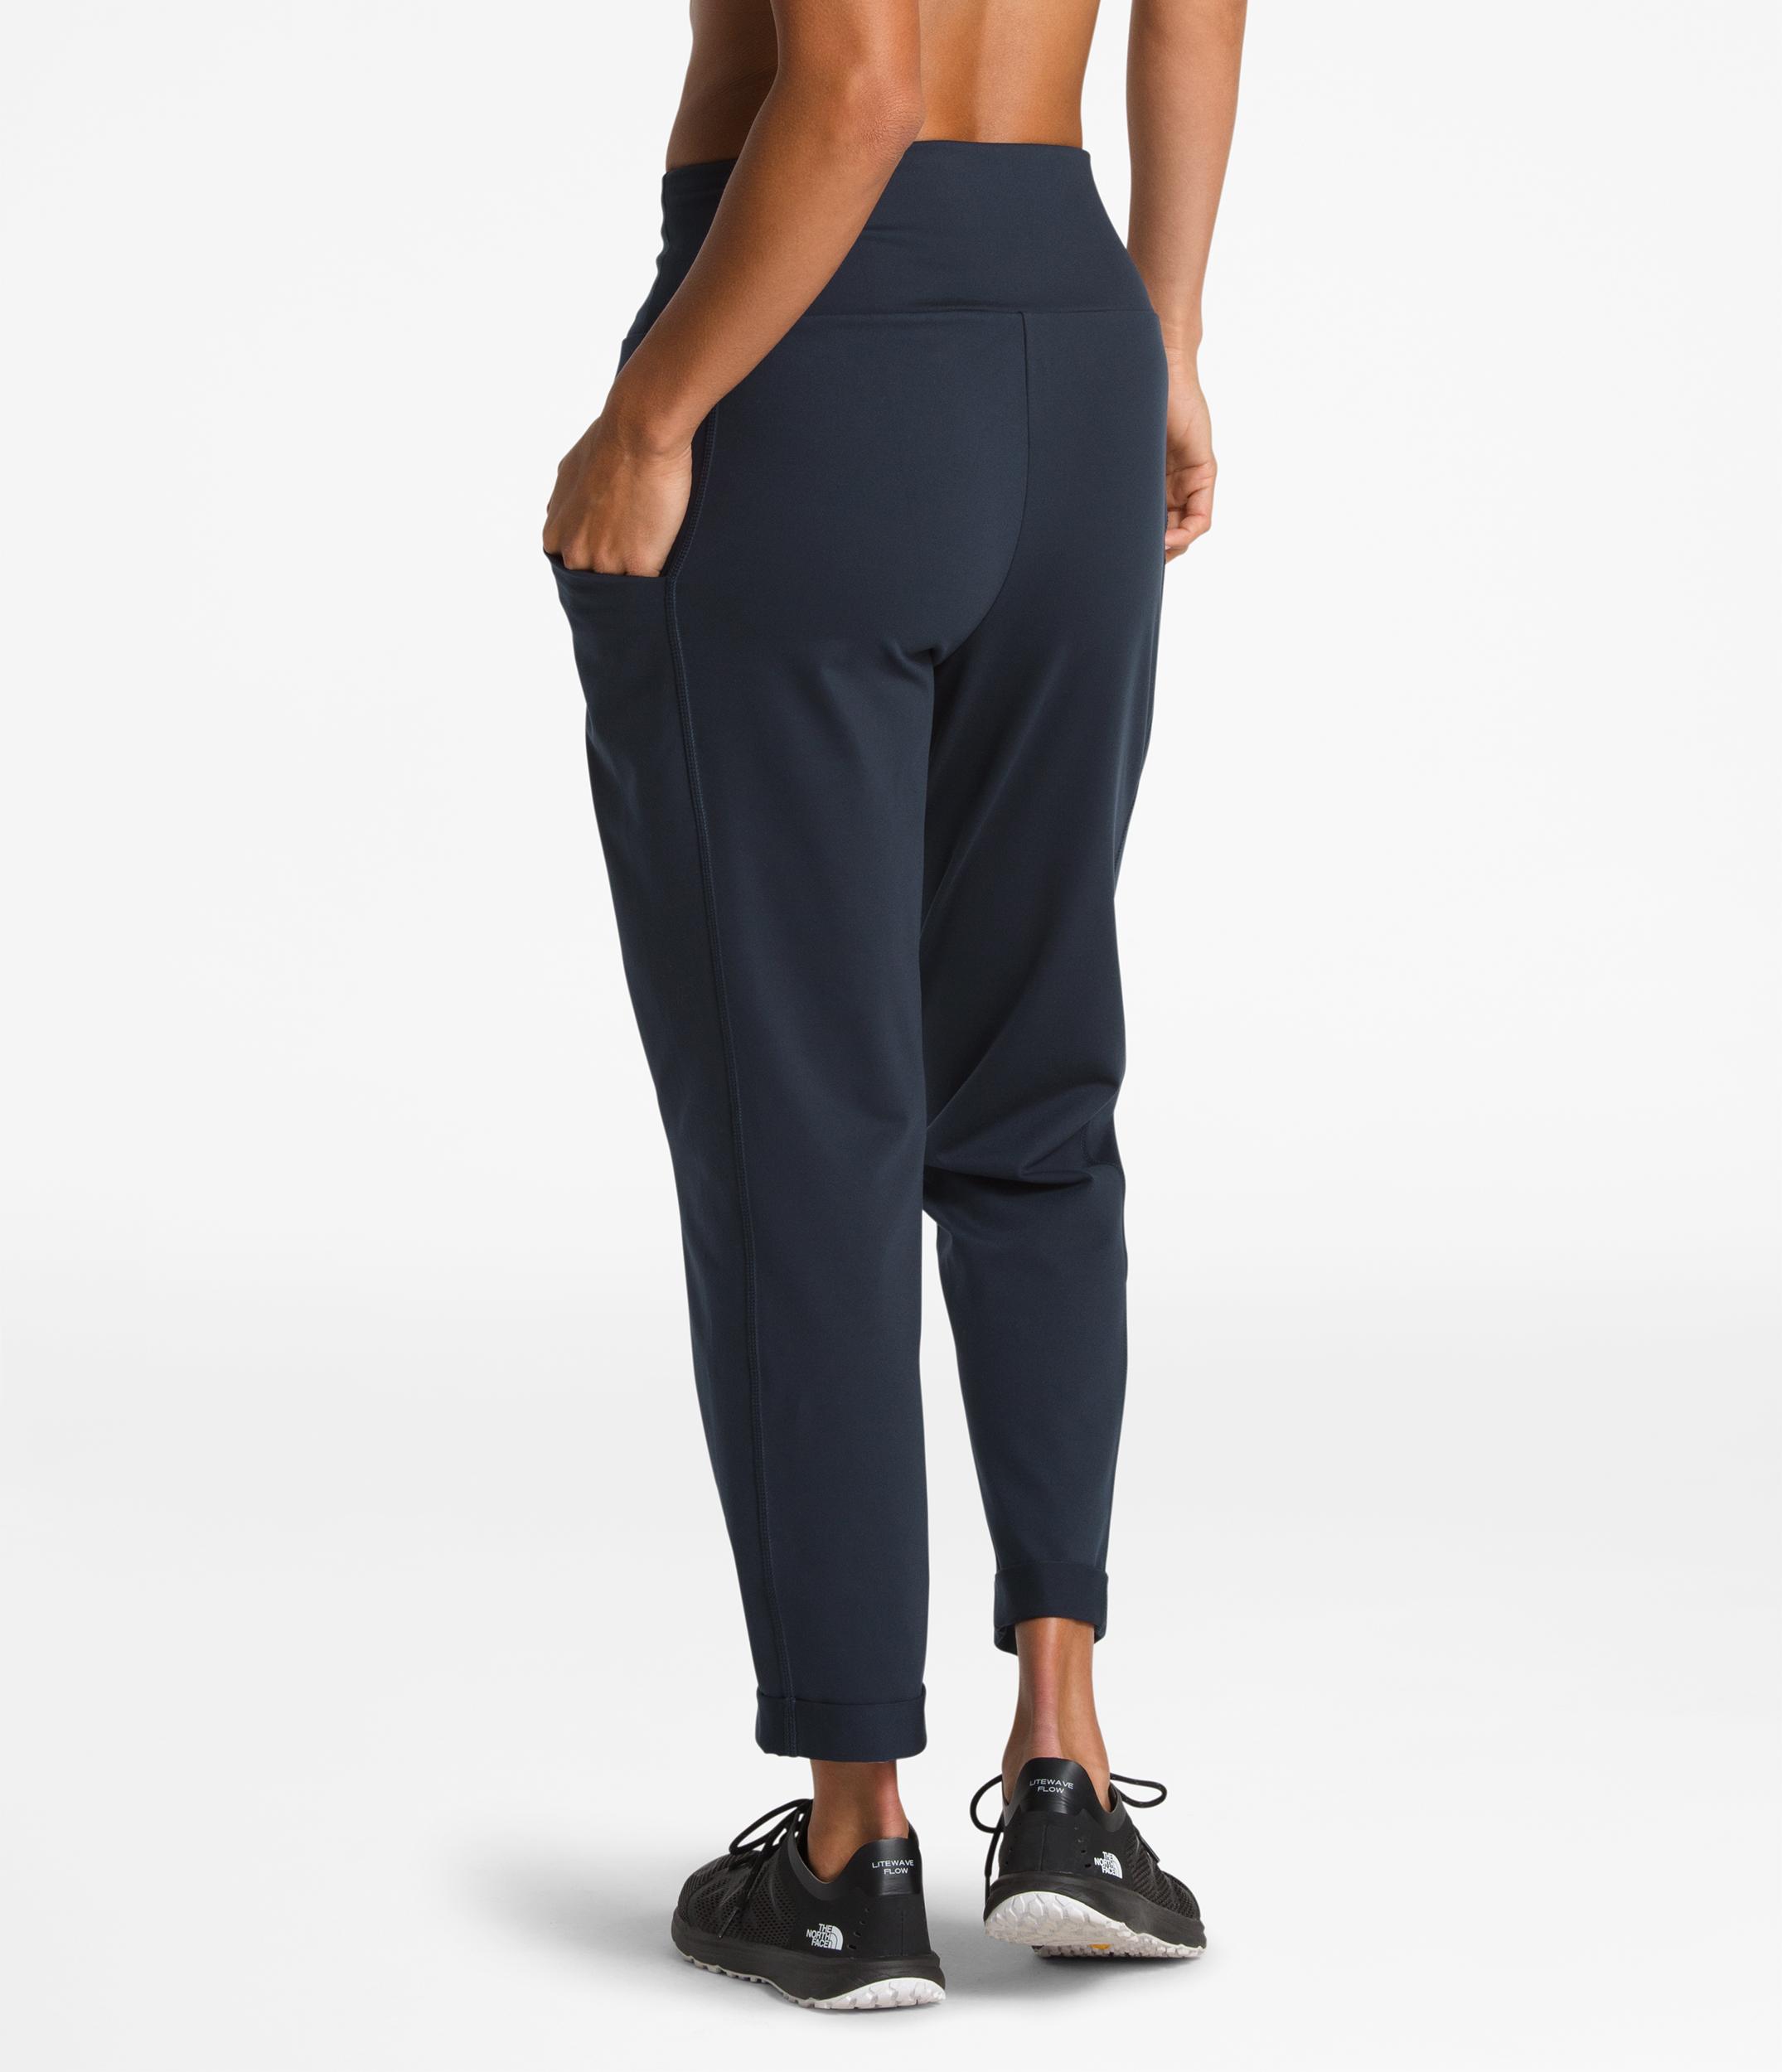 ad06a15f85b2d The North Face Motivation High-Rise 7/8 Pants - Women's   MEC